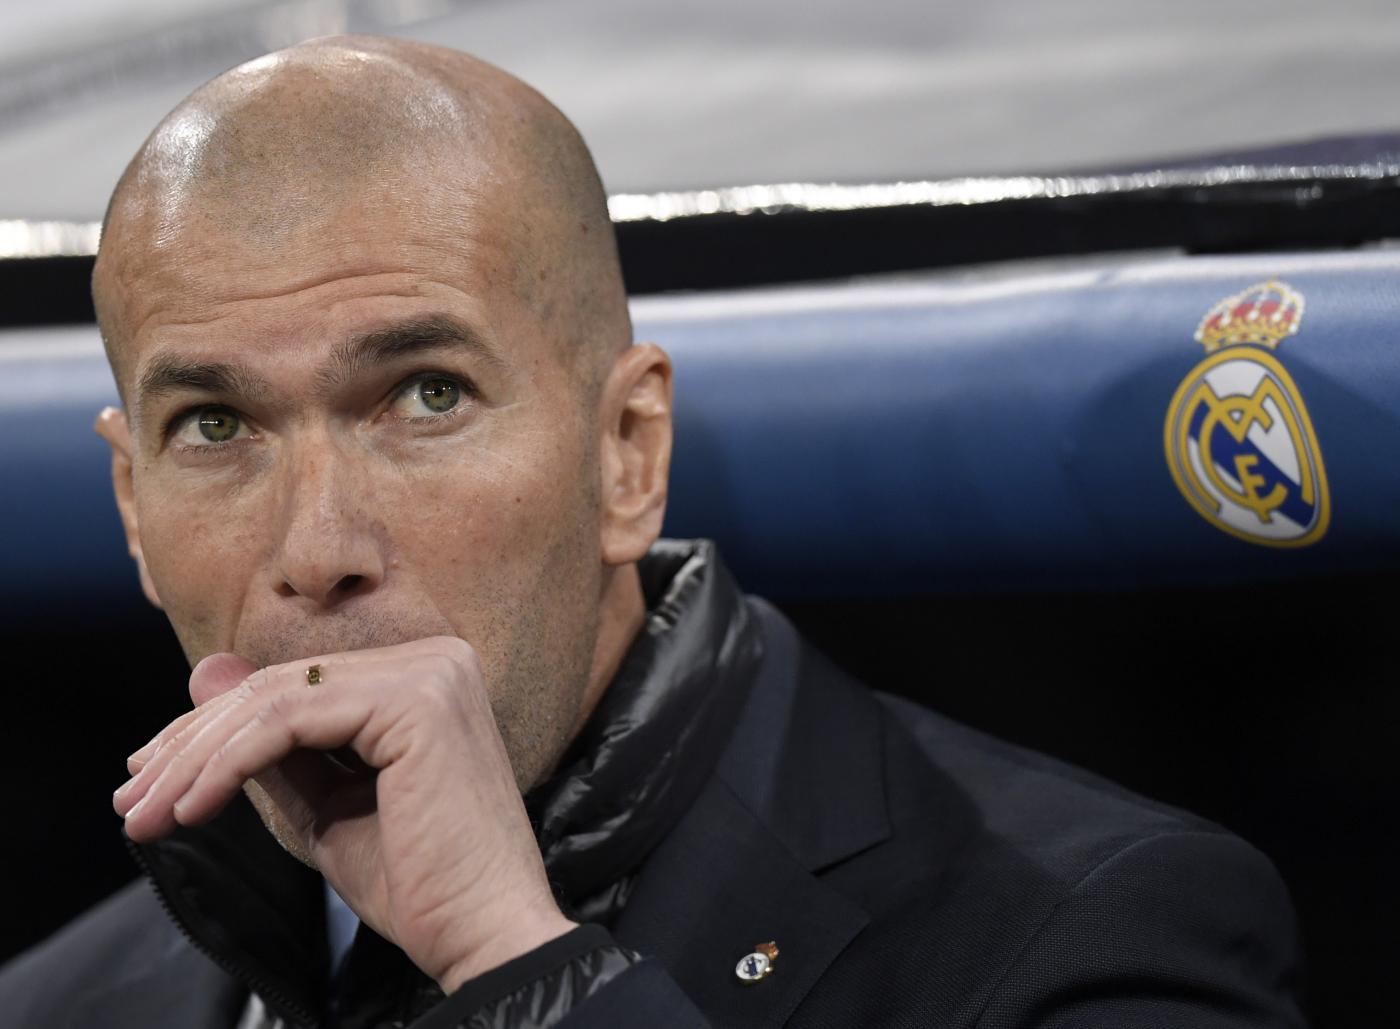 Real Madrid-Getafe sabato 3 marzo, analisi e pronostico LaLiga giornata 27